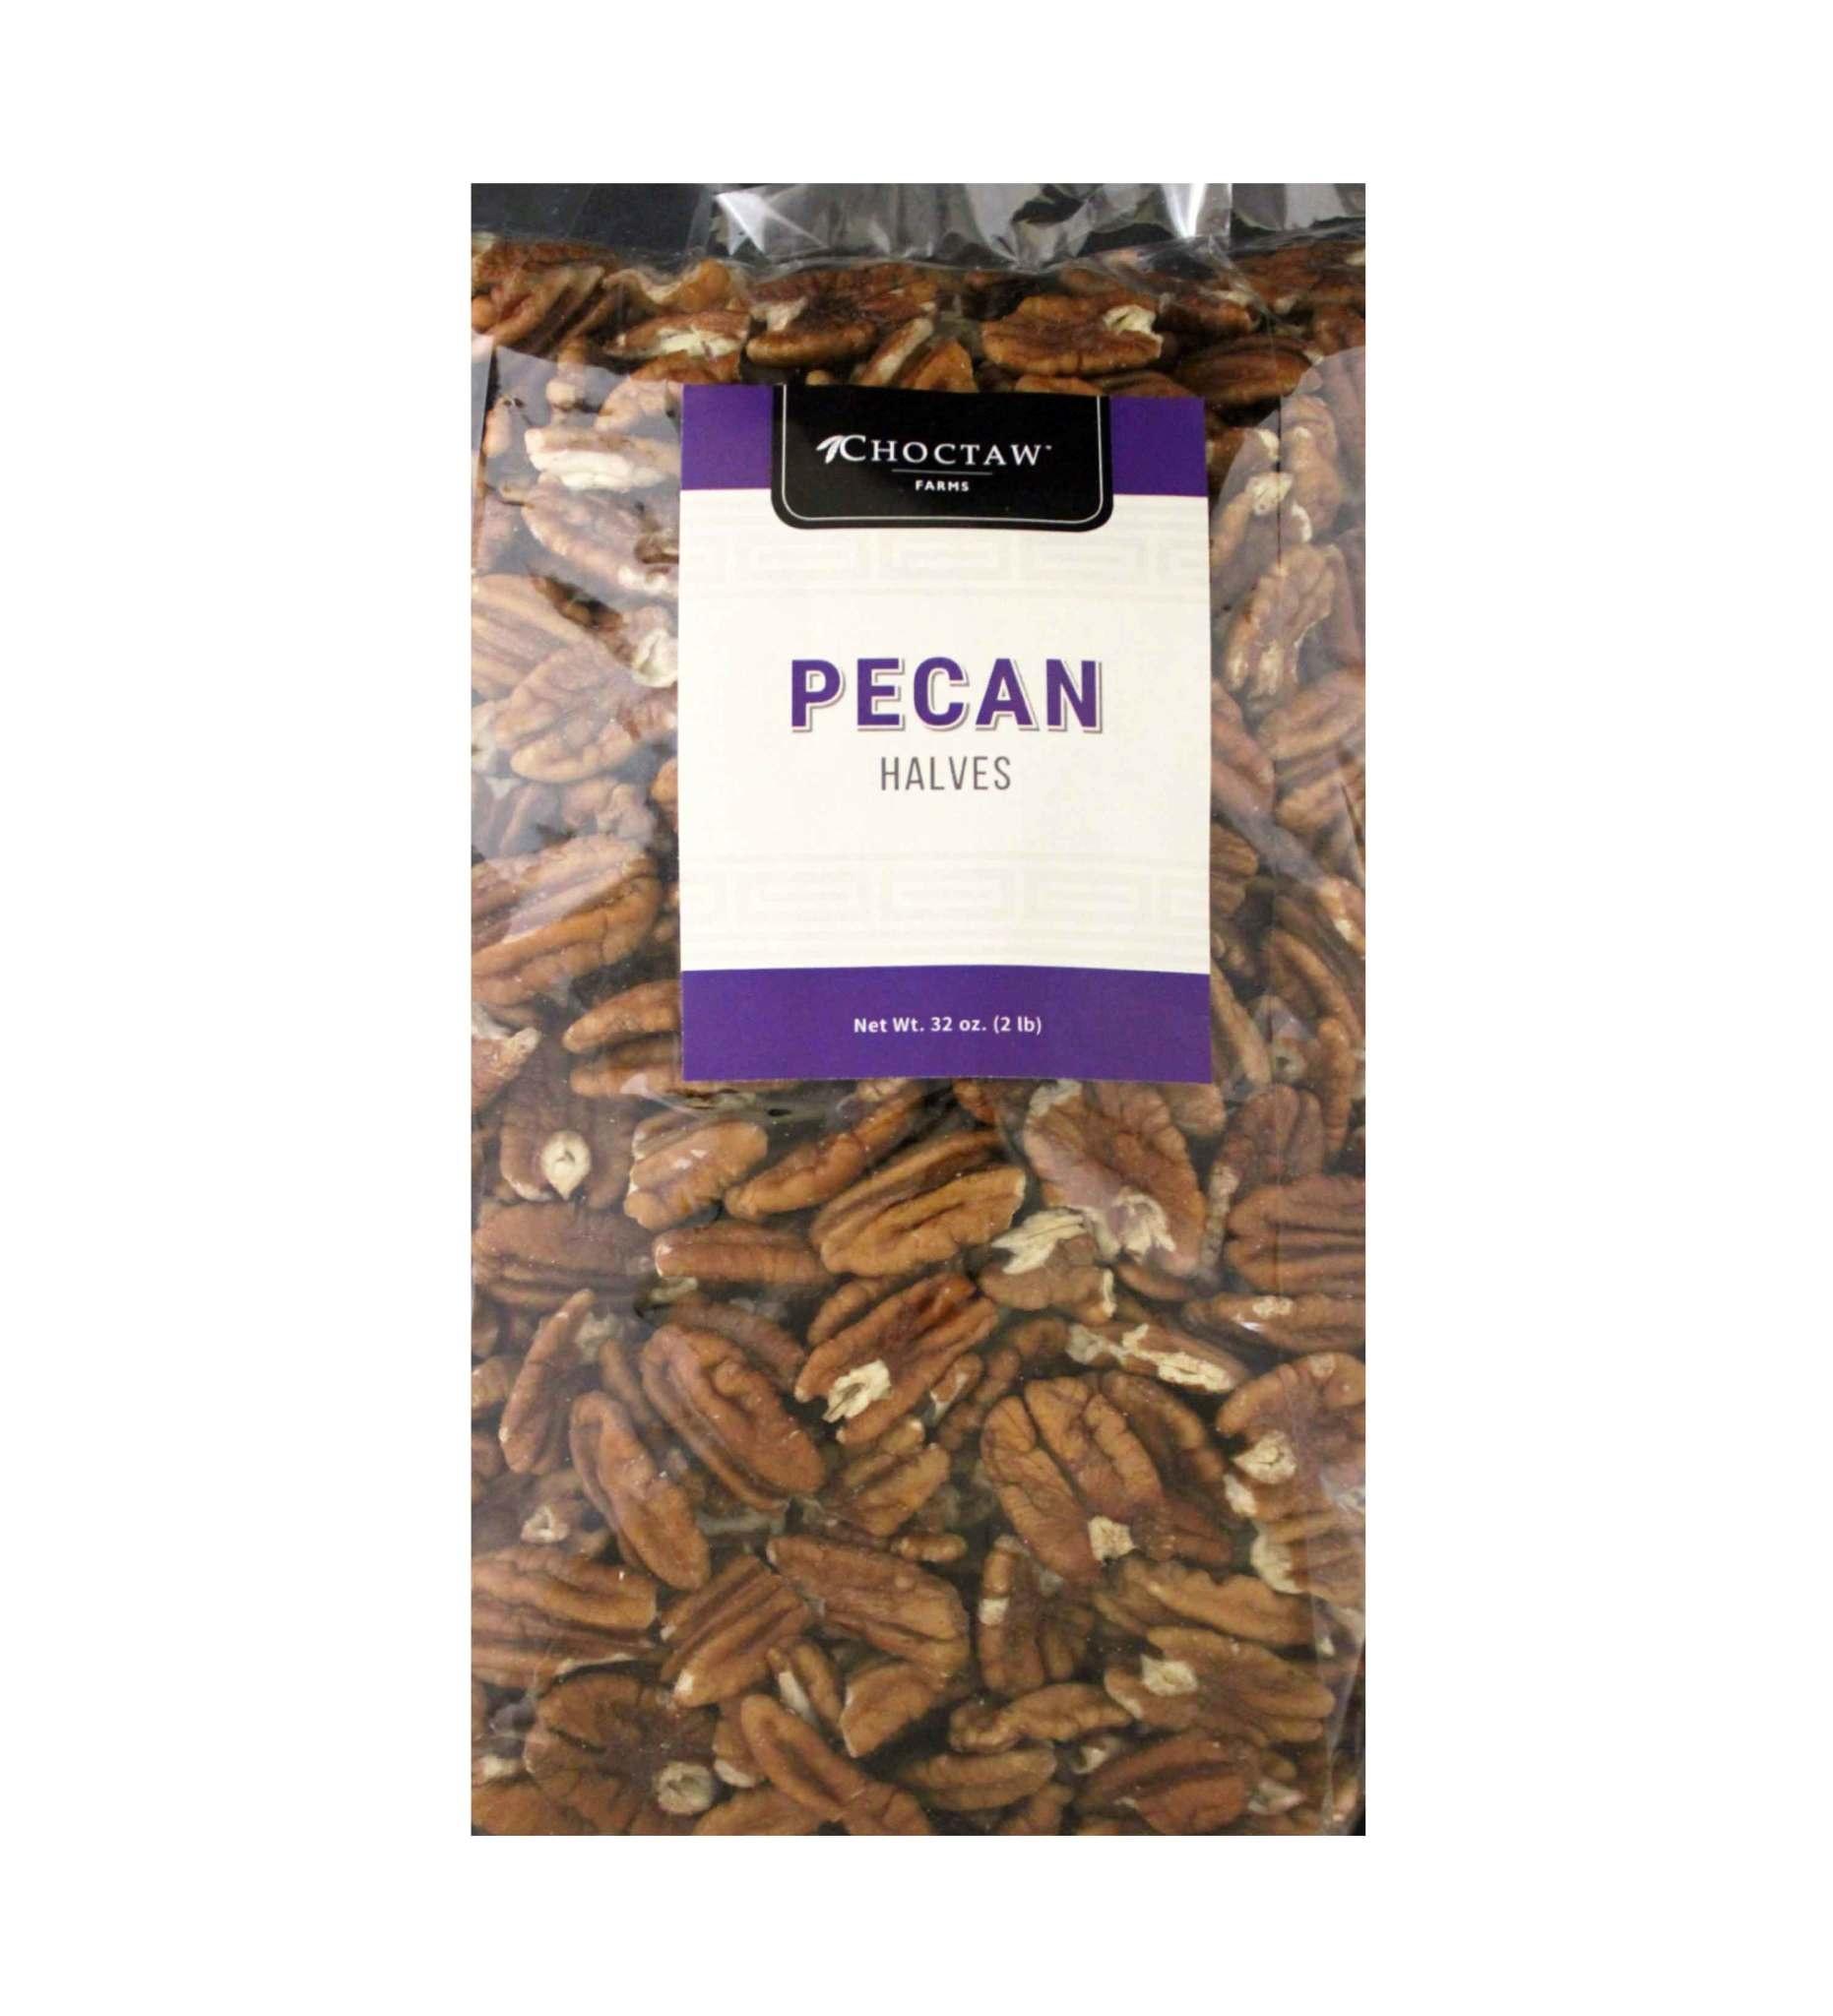 Choctaw Farms Pecans (2 lbs. Halves)